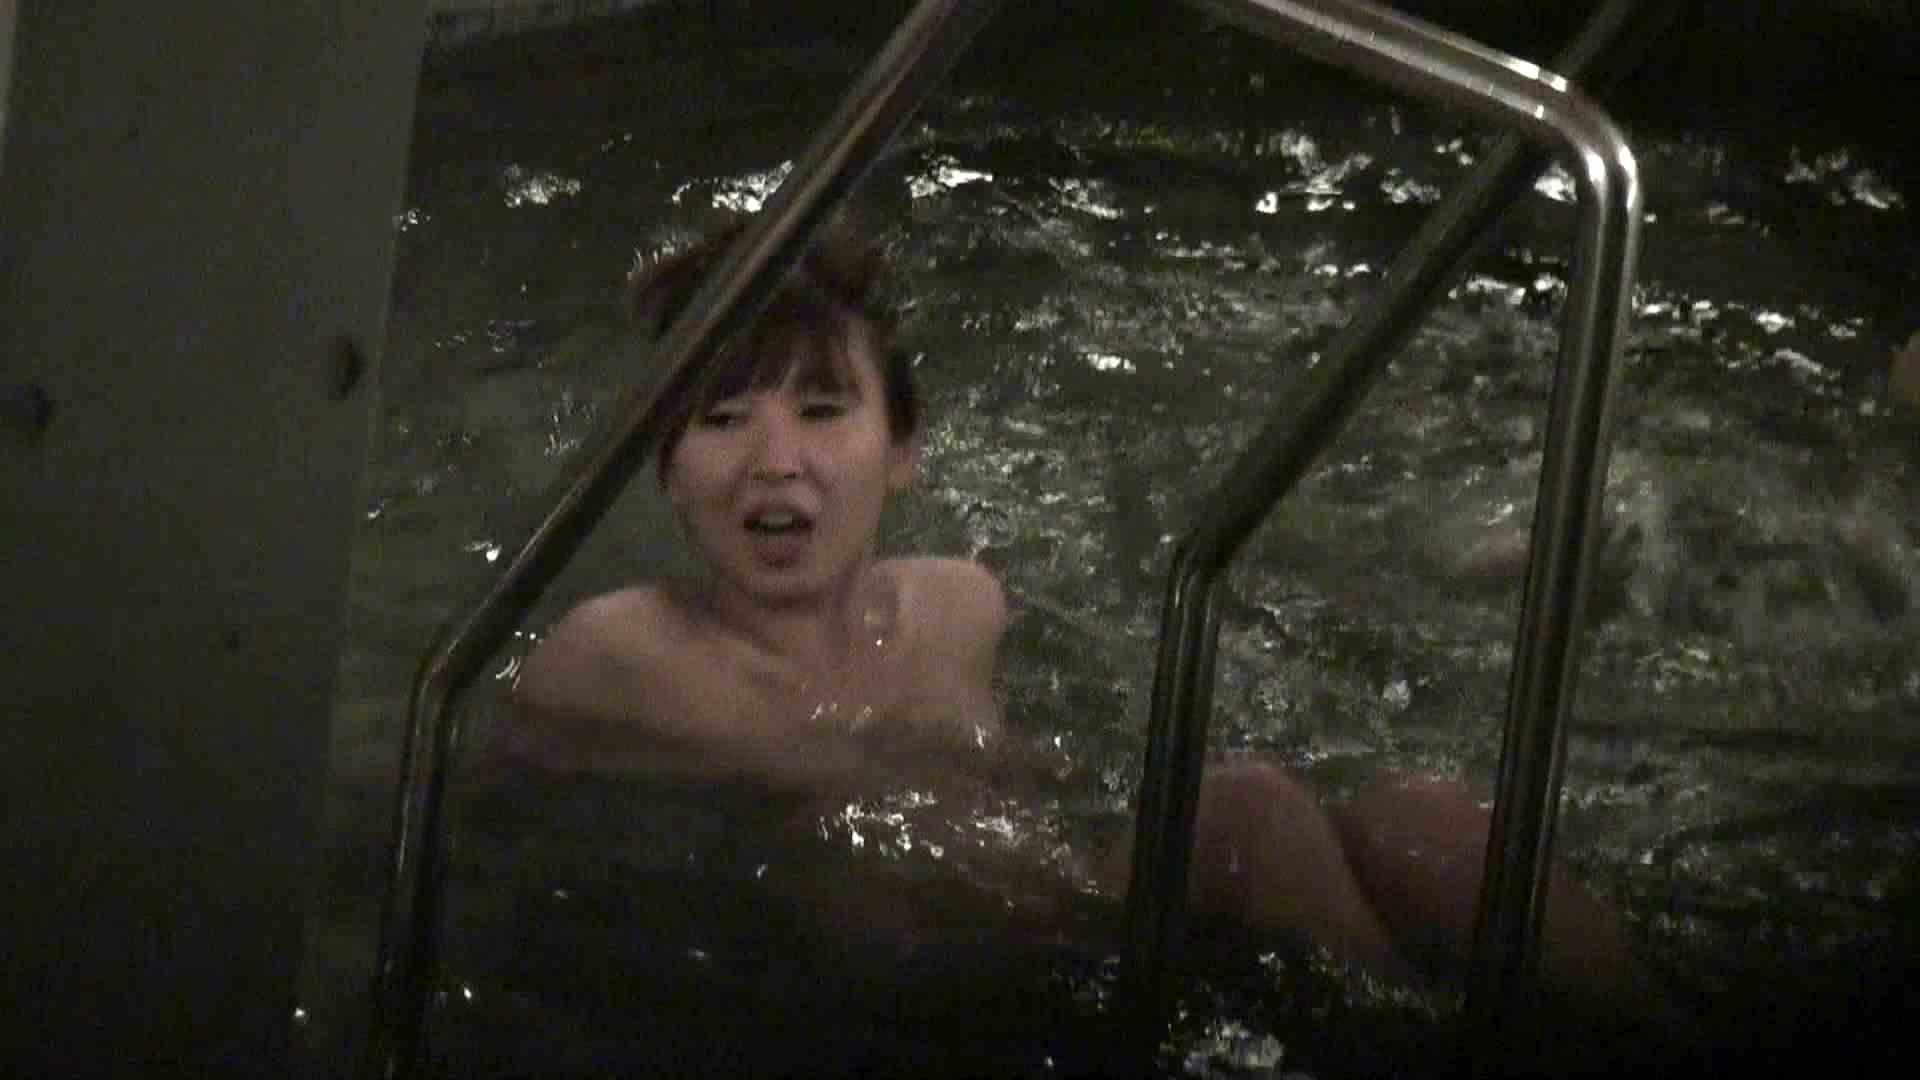 Aquaな露天風呂Vol.410 露天風呂編  94PIX 72